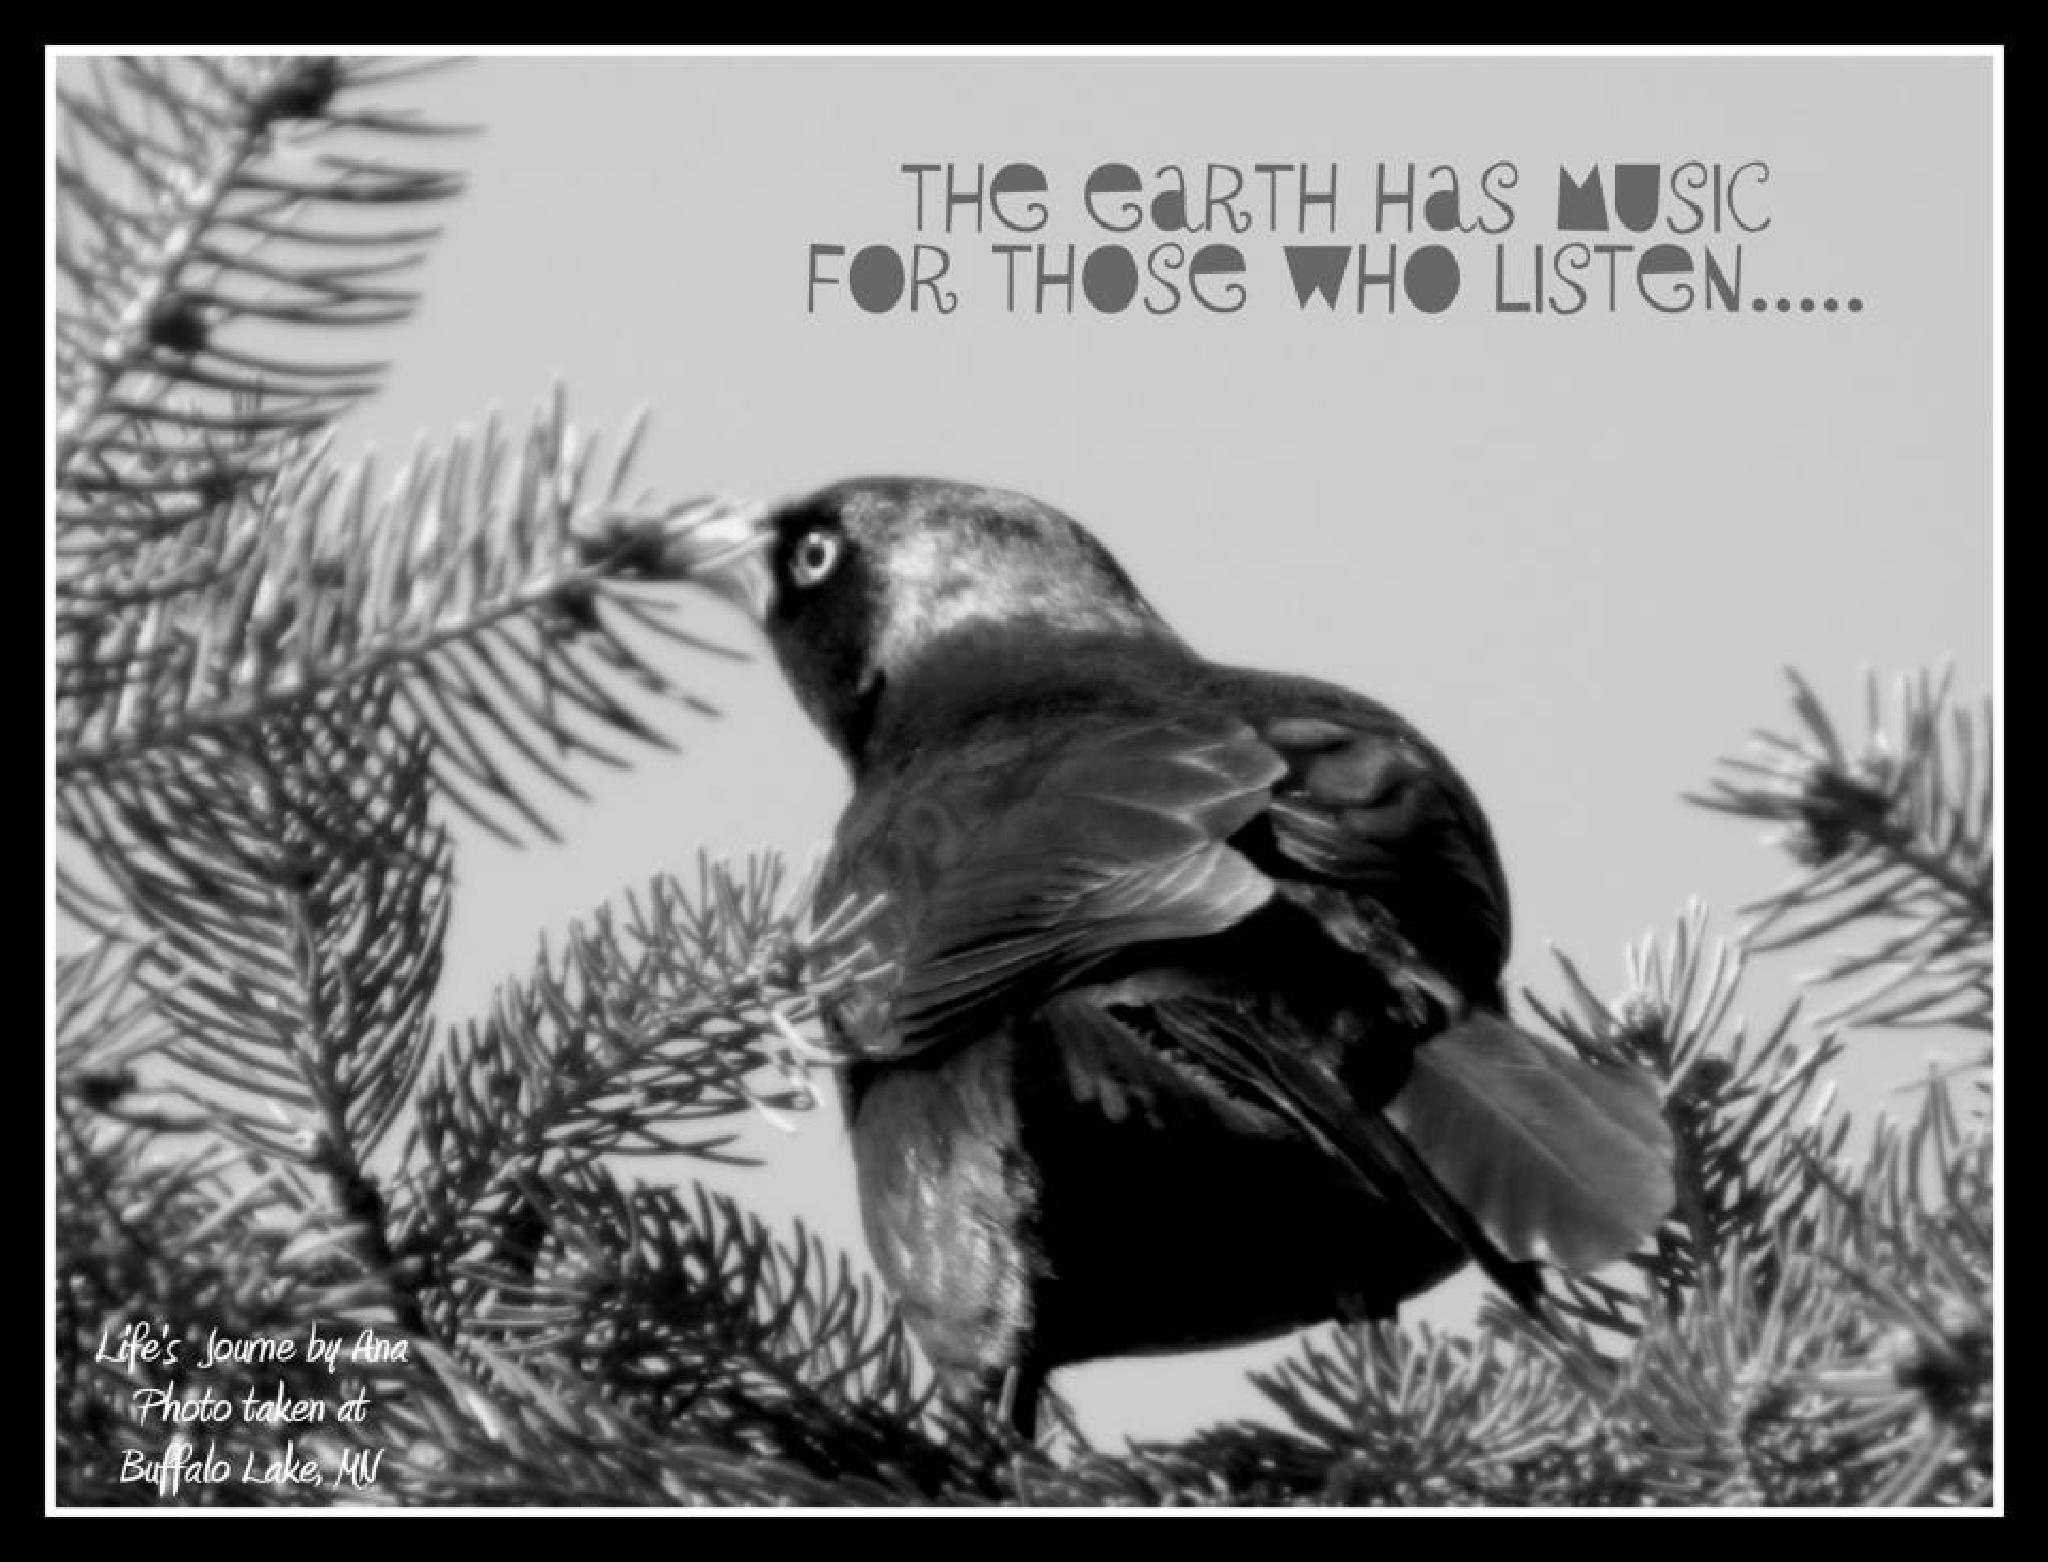 EarthHasMusic by ana.ogsimer